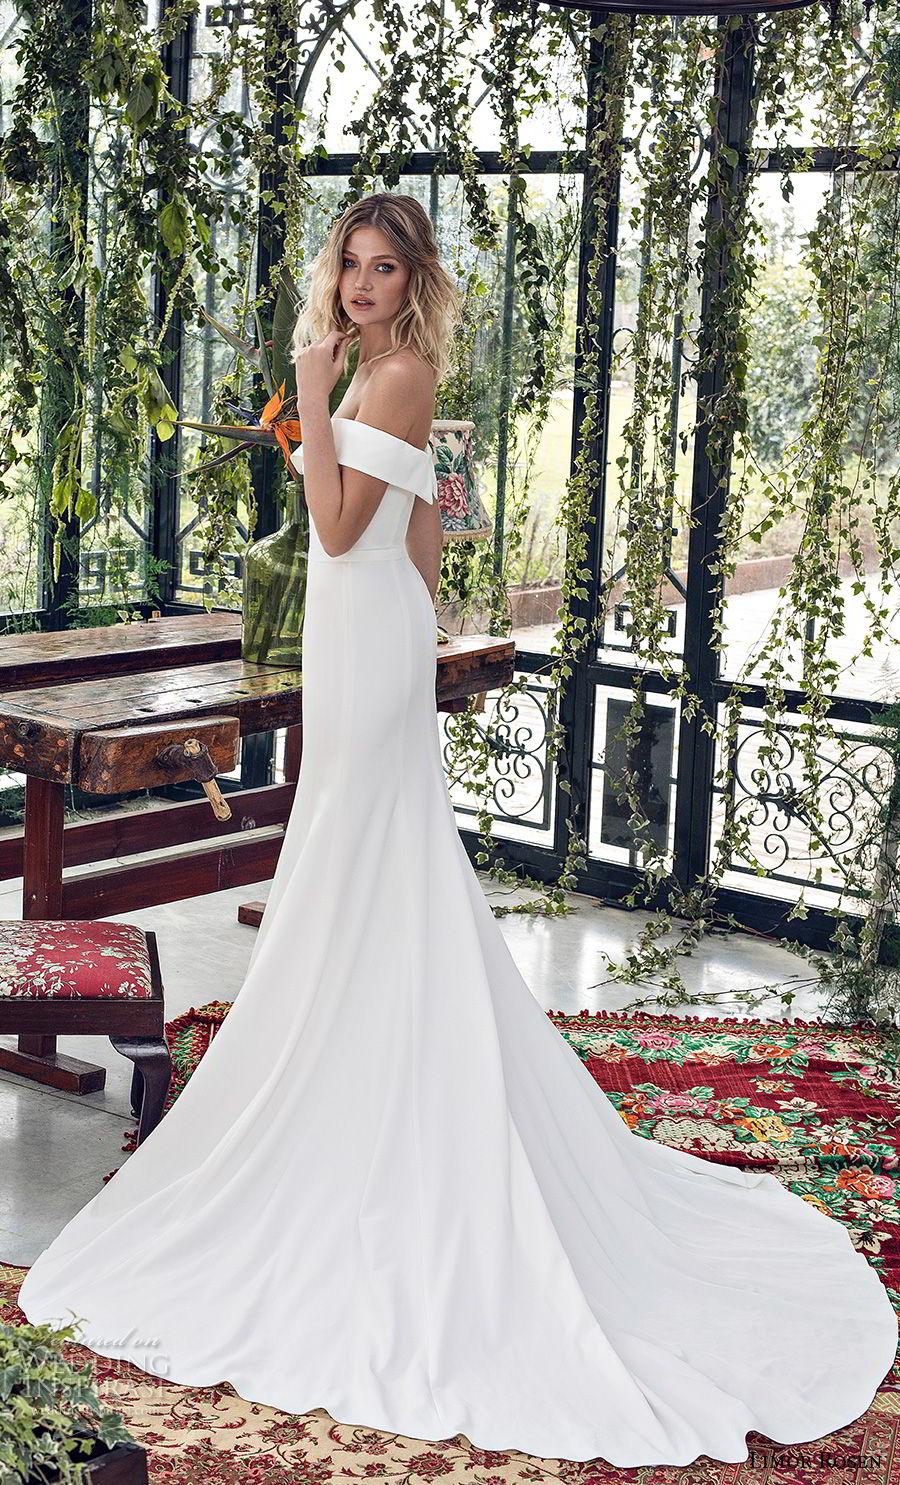 limor rosen 2019 xo bridal off the shoulder semi scoop neckline simple clean minimalist elegant fit and flare wedding dress chapel train (3) sdv